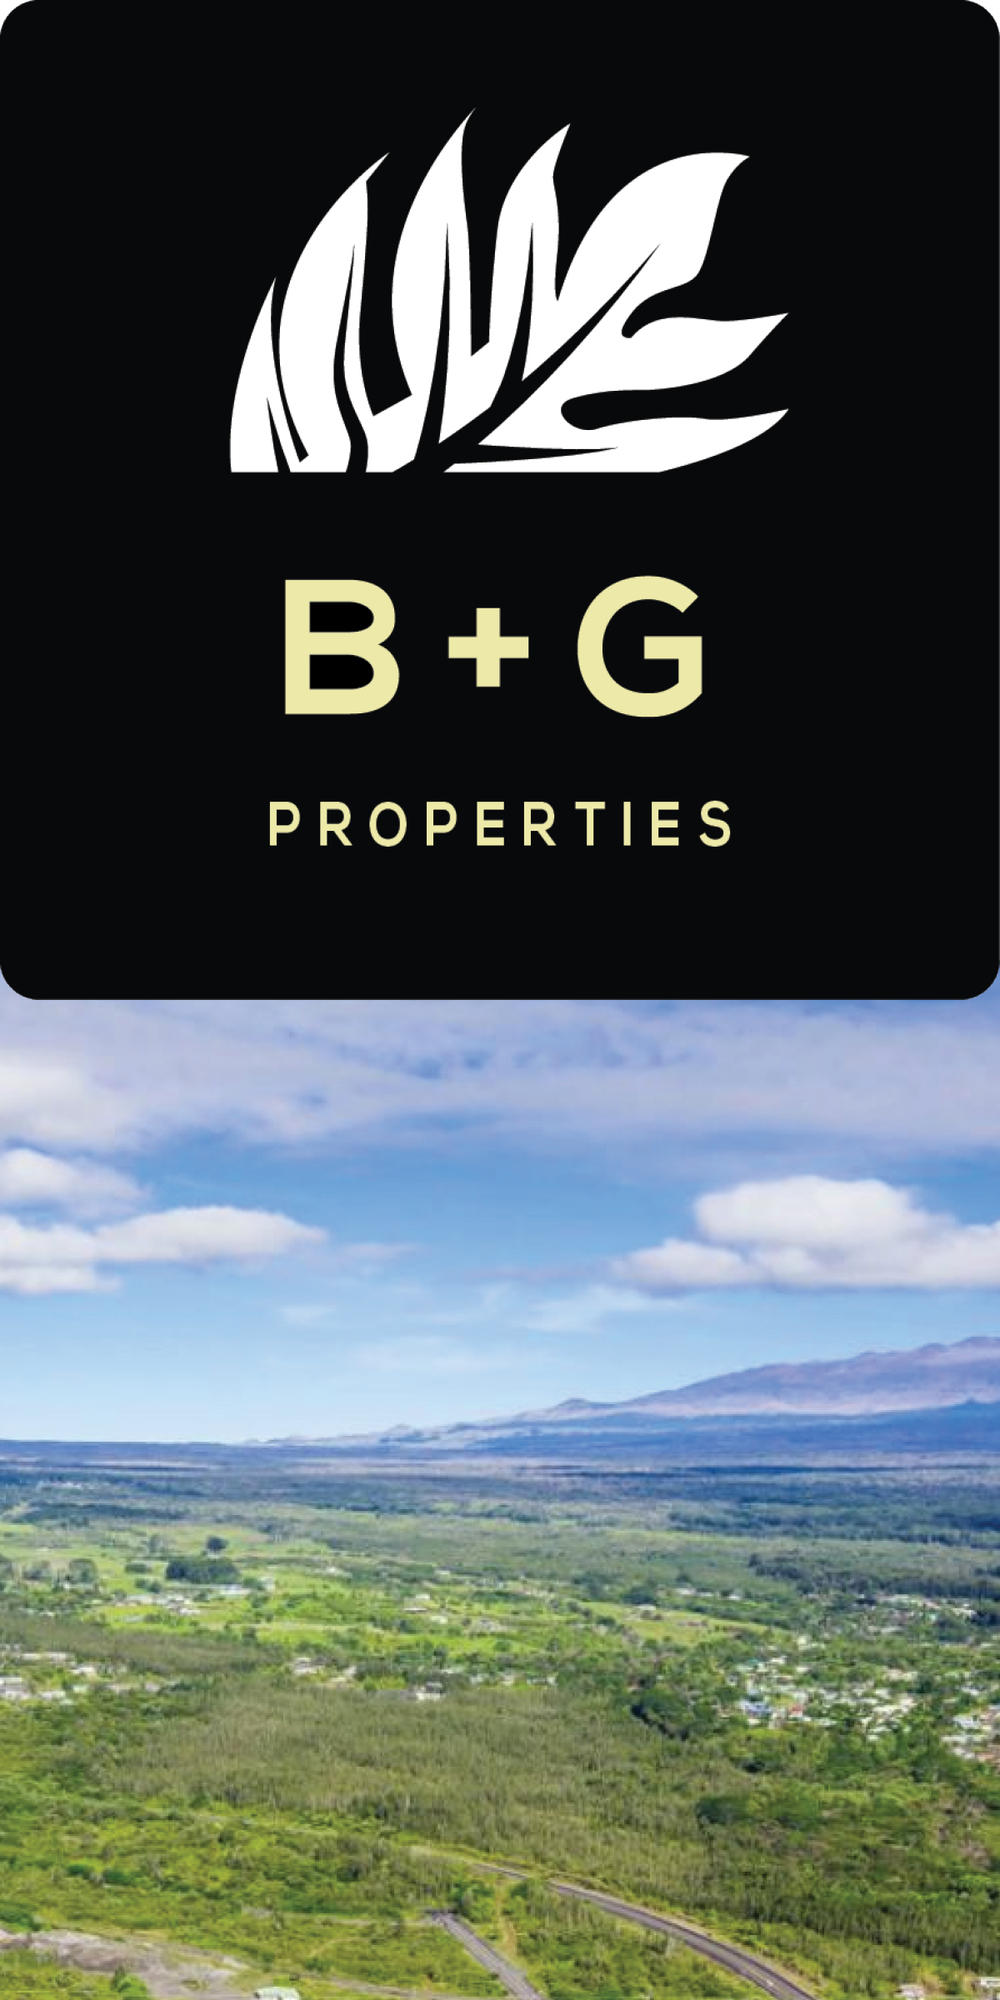 B+G_SQUARES+PHOTOS4.jpg